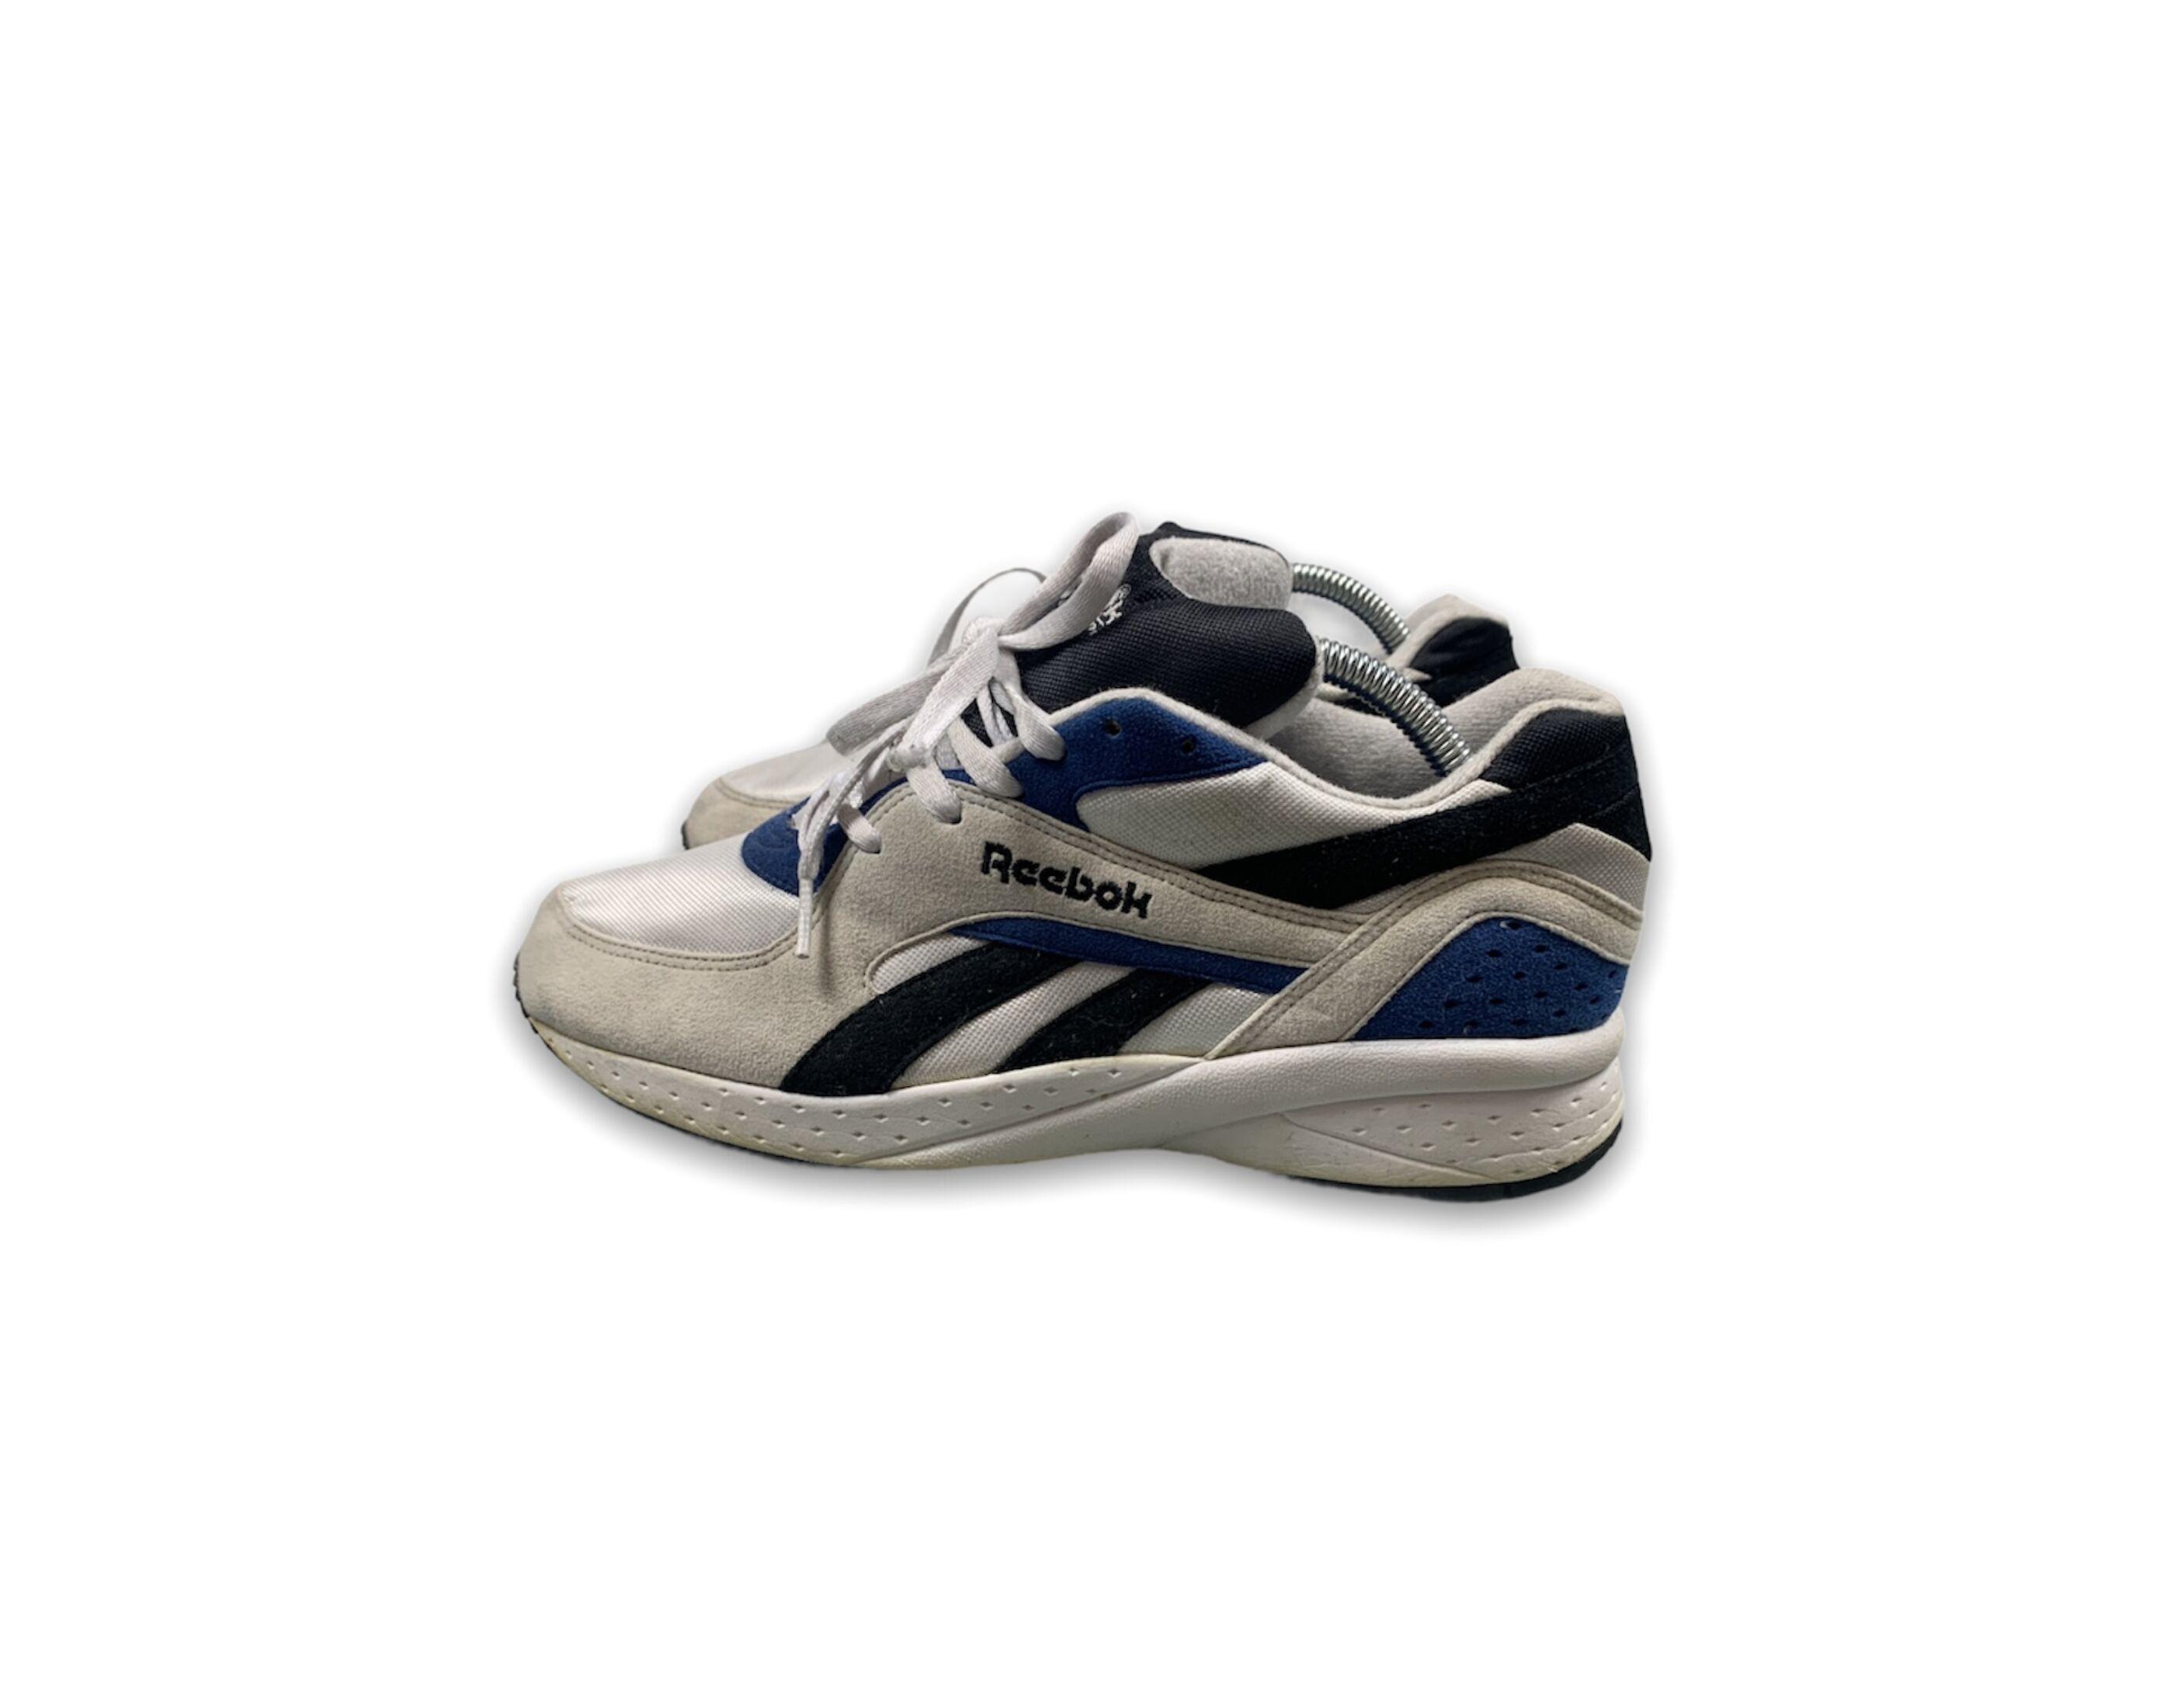 Vintage Reebok cipő (42)